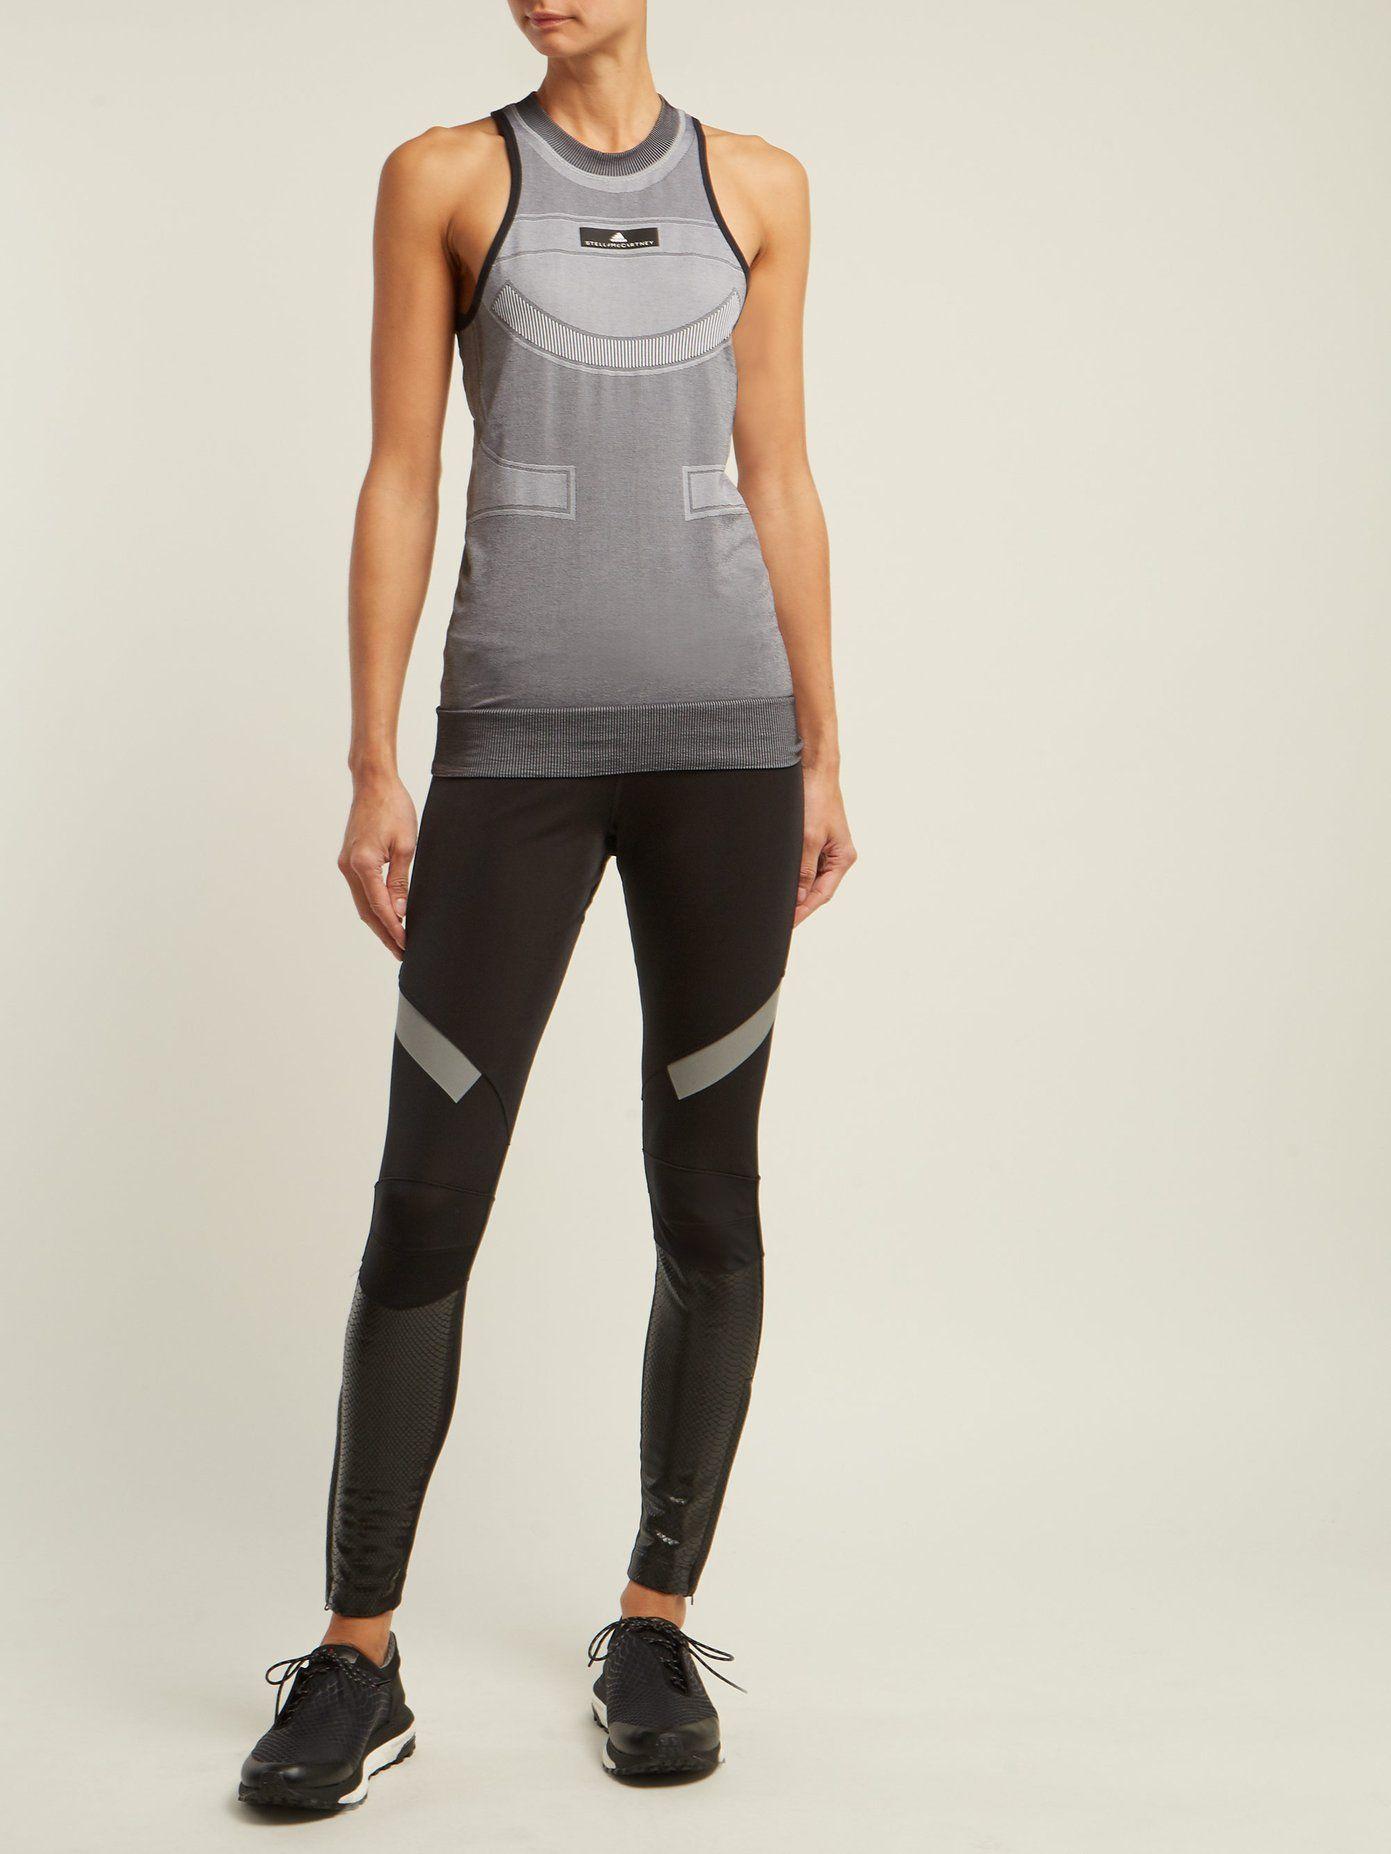 size 40 cc764 0bfc8 Run Climaheat leggings   Adidas By Stella McCartney   MATCHESFASHION.COM US   affiliate